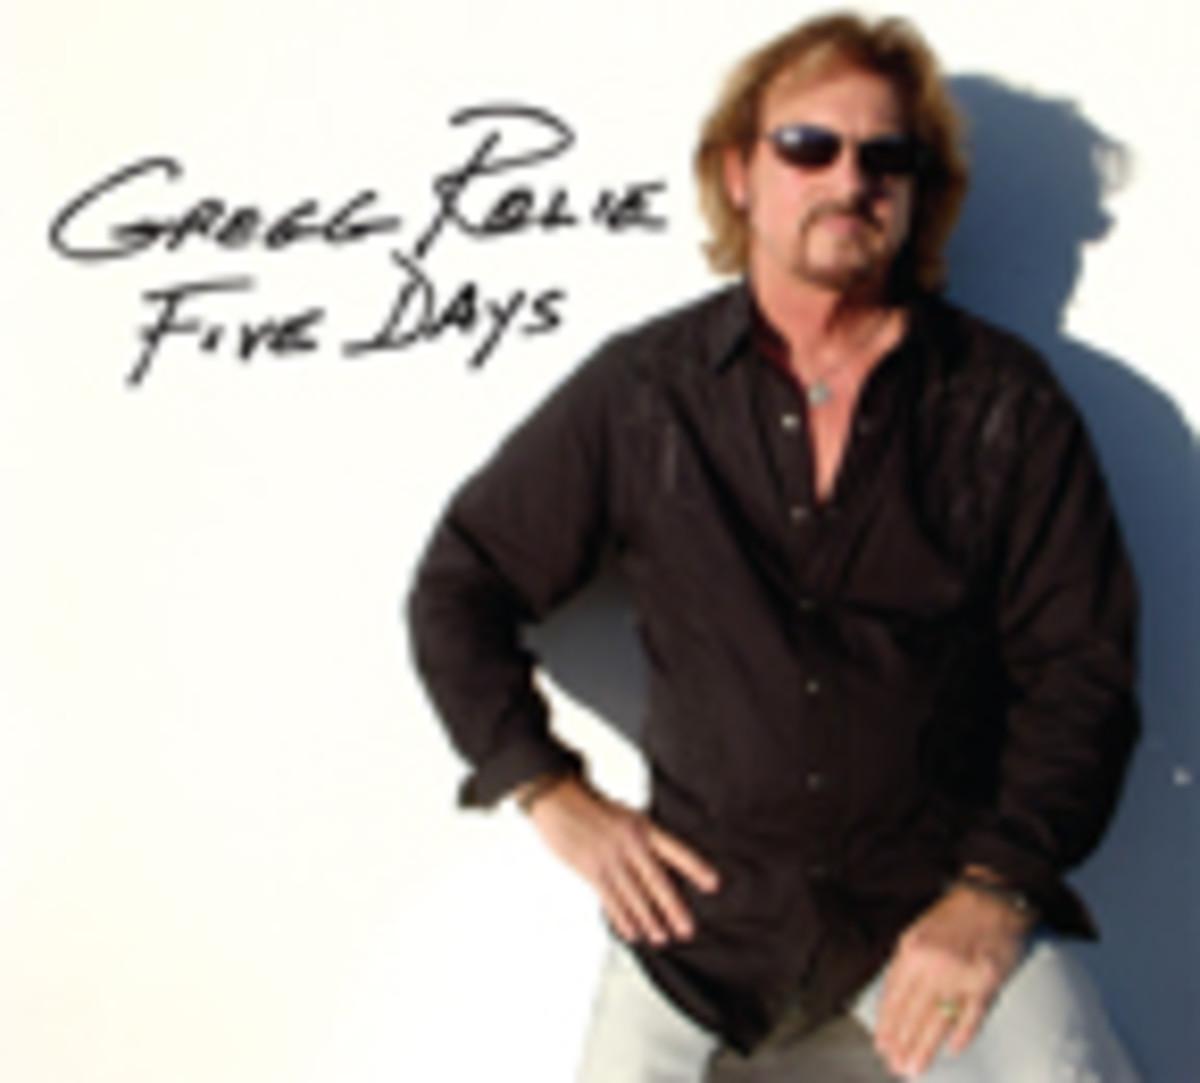 Gregg_Rolie_Five_Days